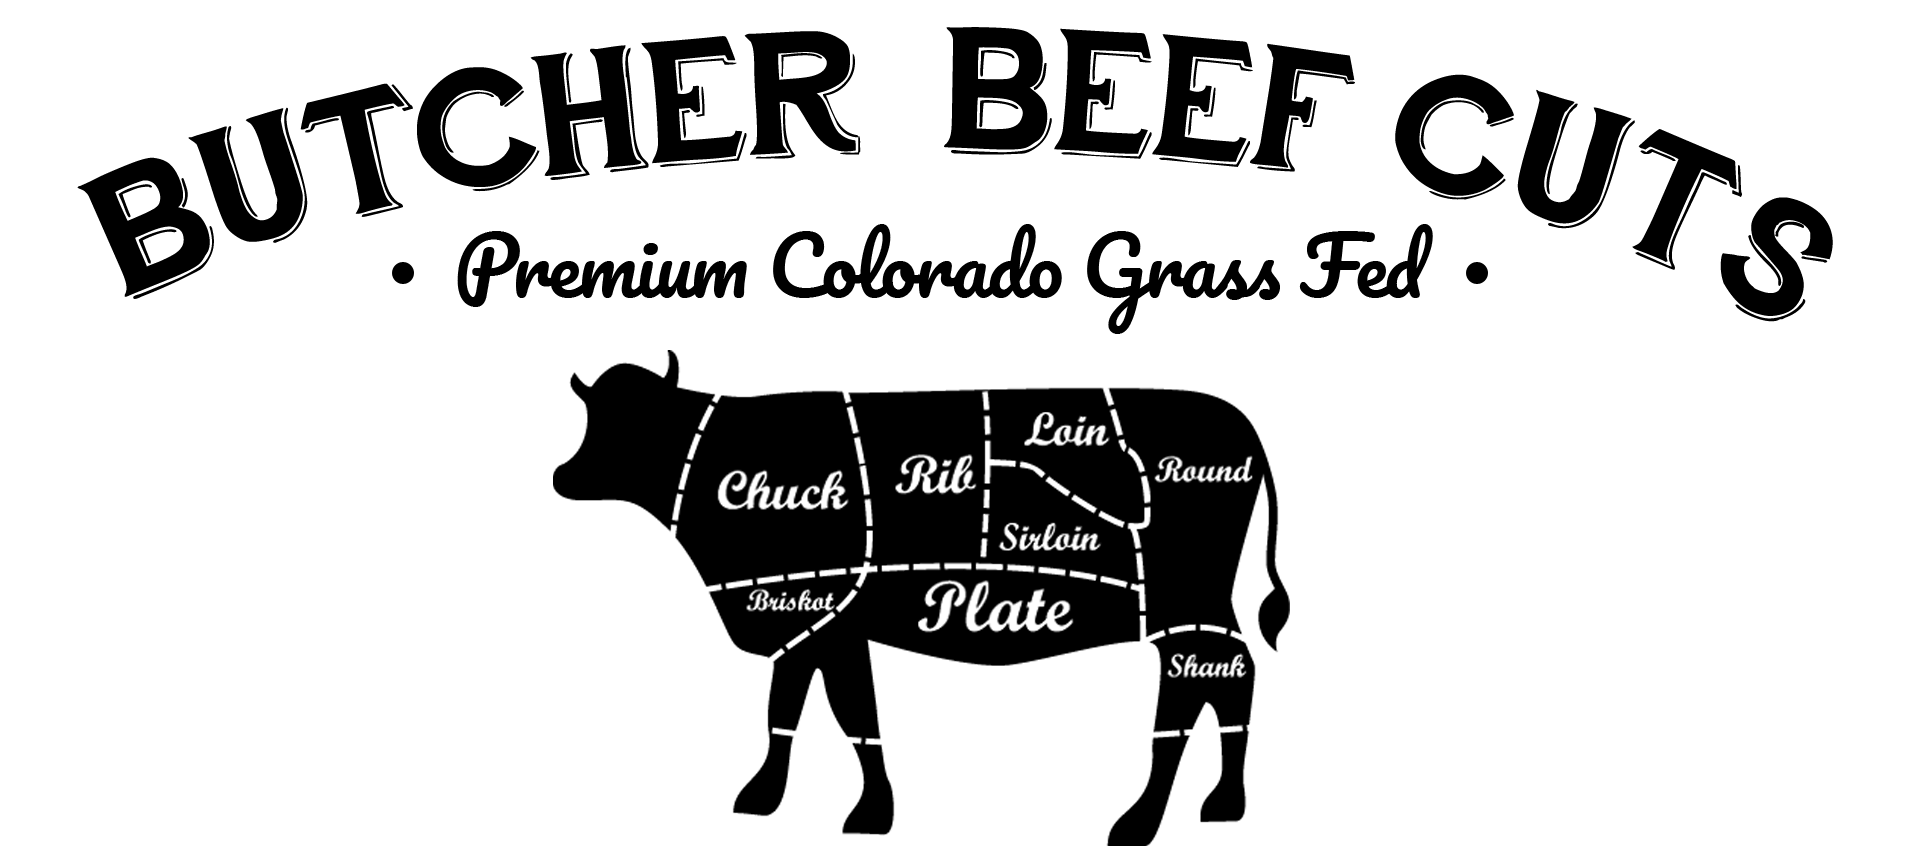 beef cow cut diagram 95 jeep grand cherokee wiring chart flying b bar ranch colorado grass fed